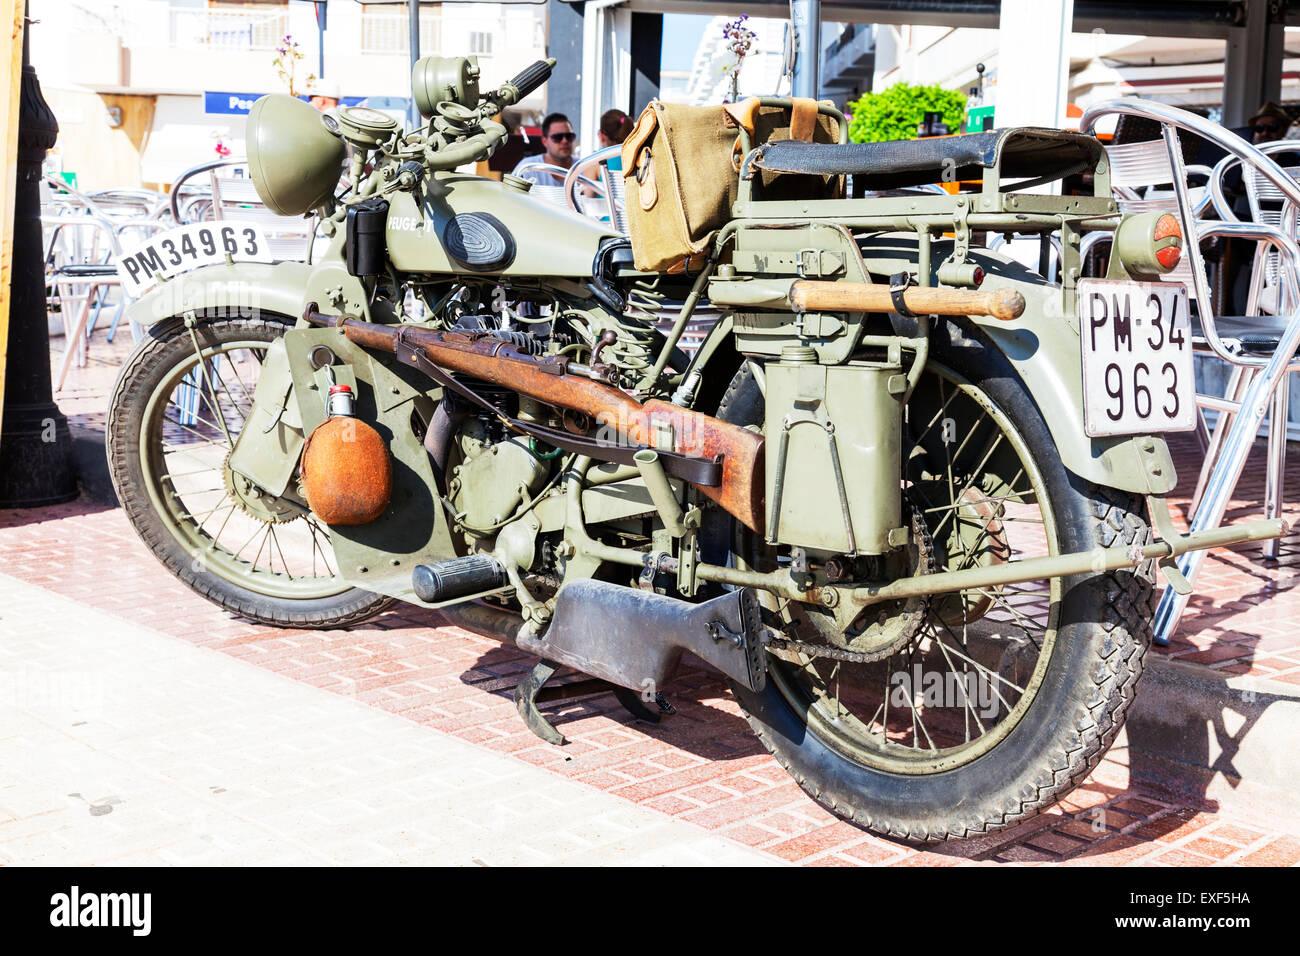 peugeot motorbike ww2 army motorcycle bike colors colours gun weapon water bottle - Stock Image